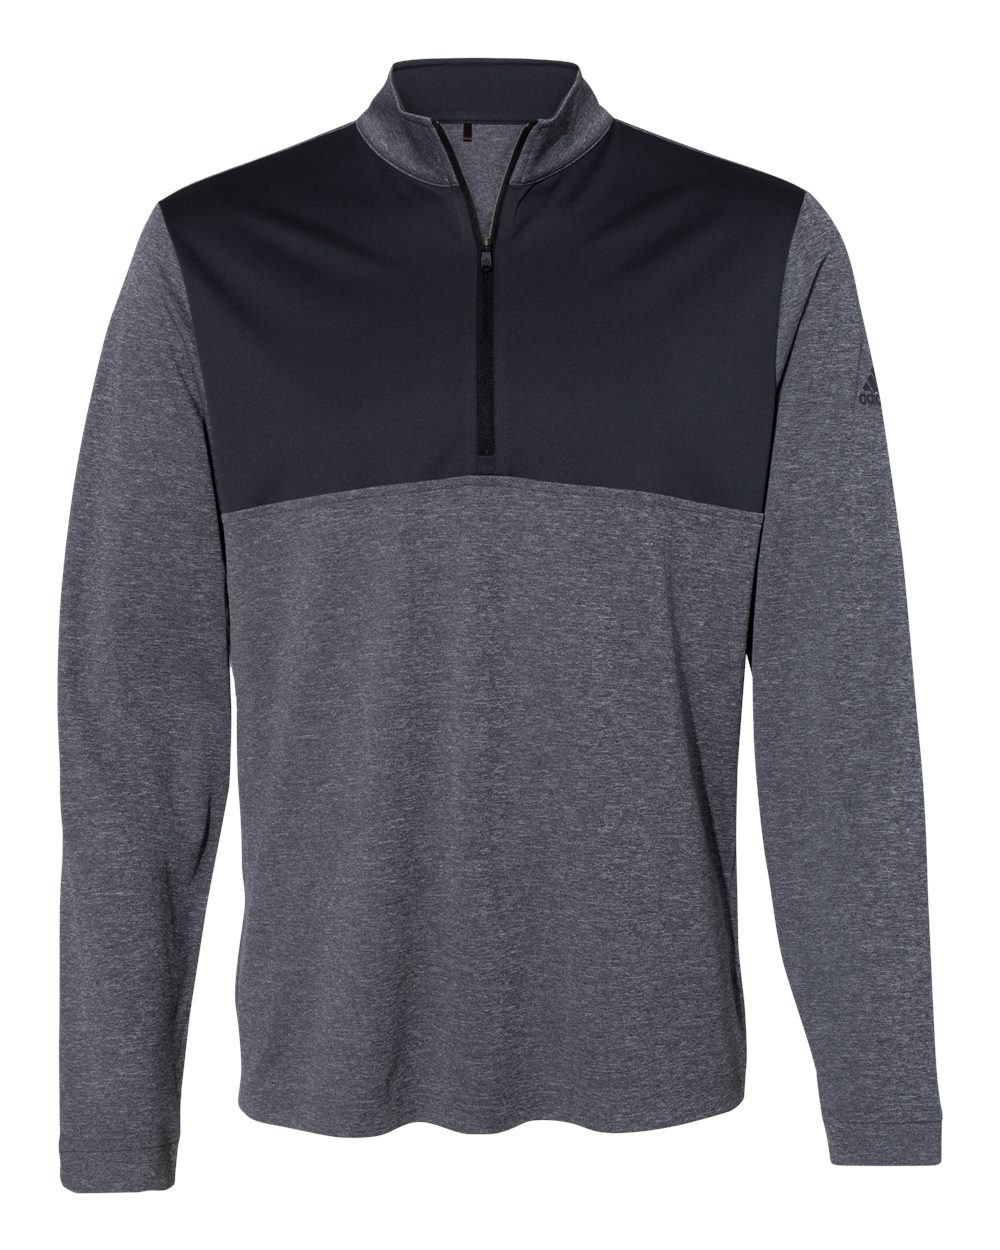 Adidas-Mens-Lightweight-UPF-pullover-Shirt-Warmup-A280-up-to-4XL thumbnail 6